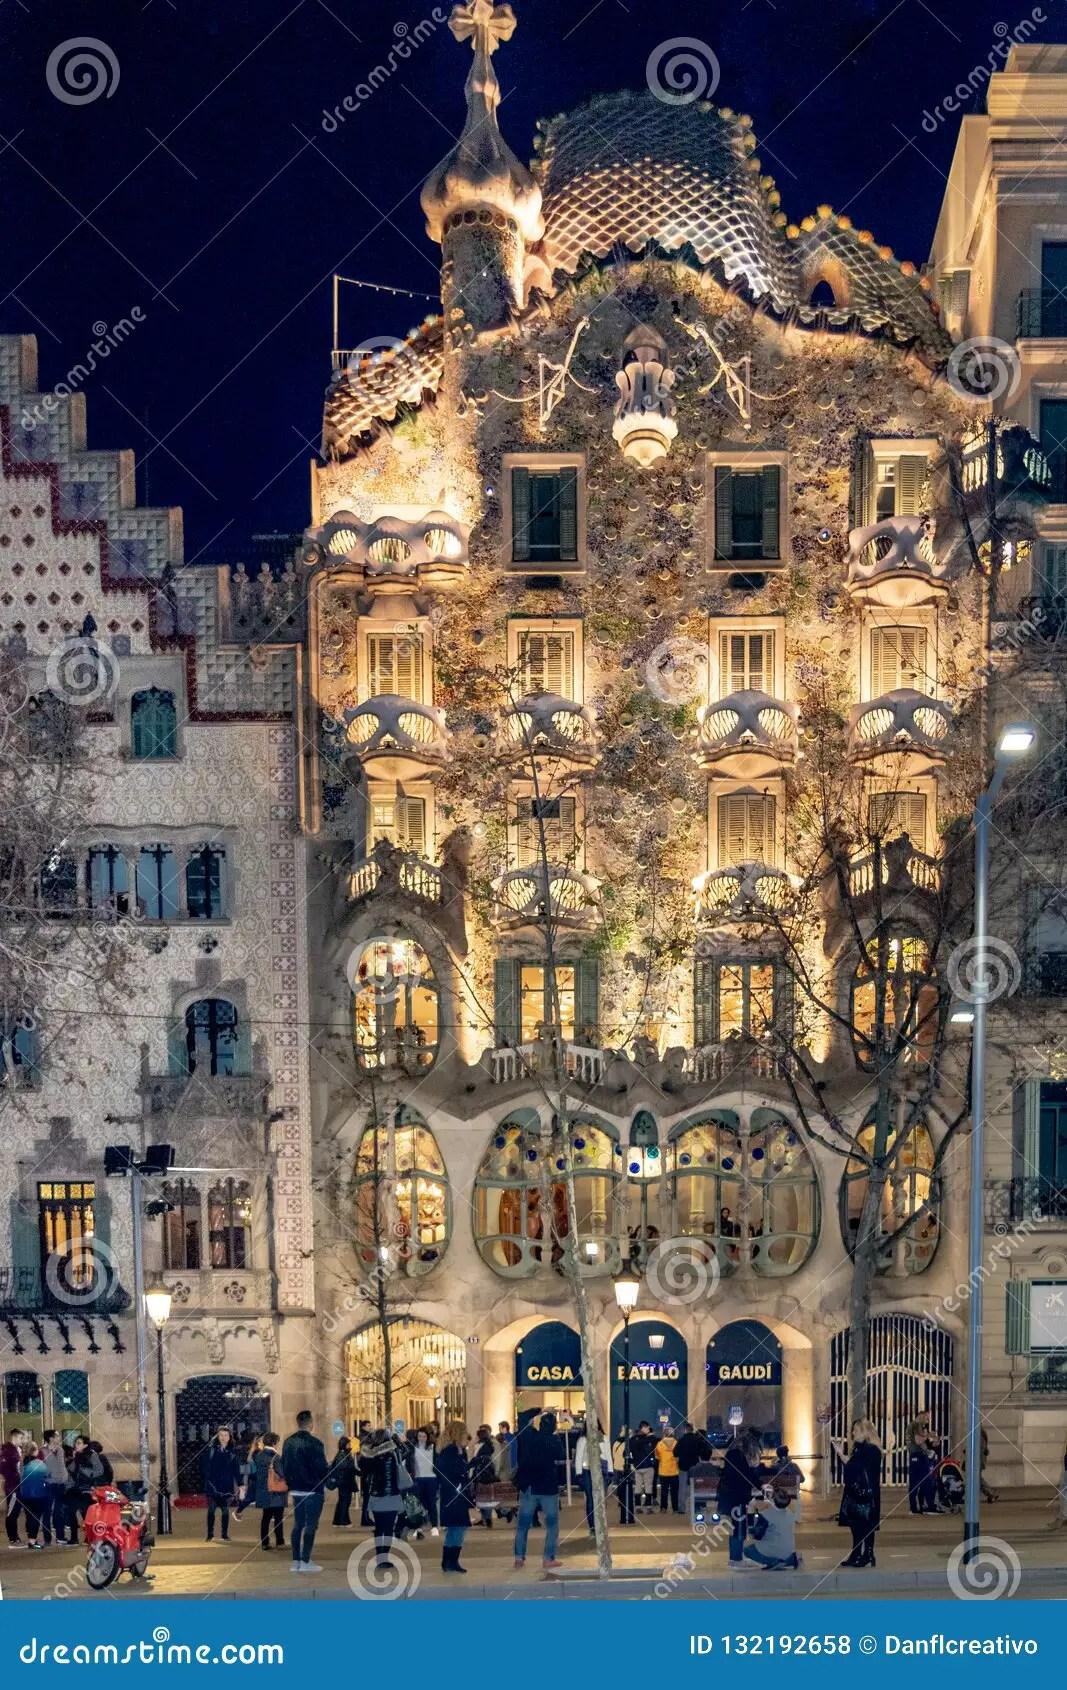 Gaudi Batllo House Building Barcelona Spain Editorial Stock Photo Image Of Famous Architect 132192658